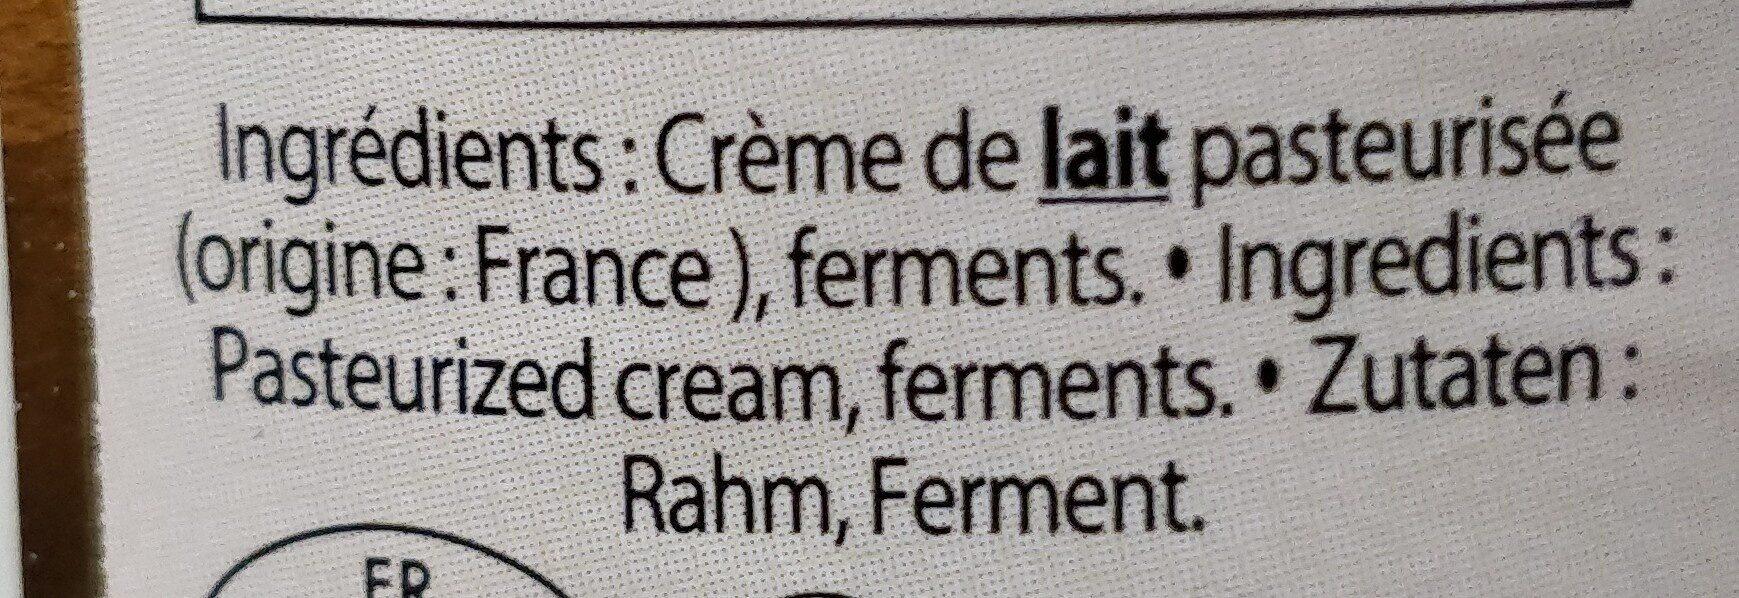 Creme fraiche de Normandie Epaisse 40% - Ingredients - en